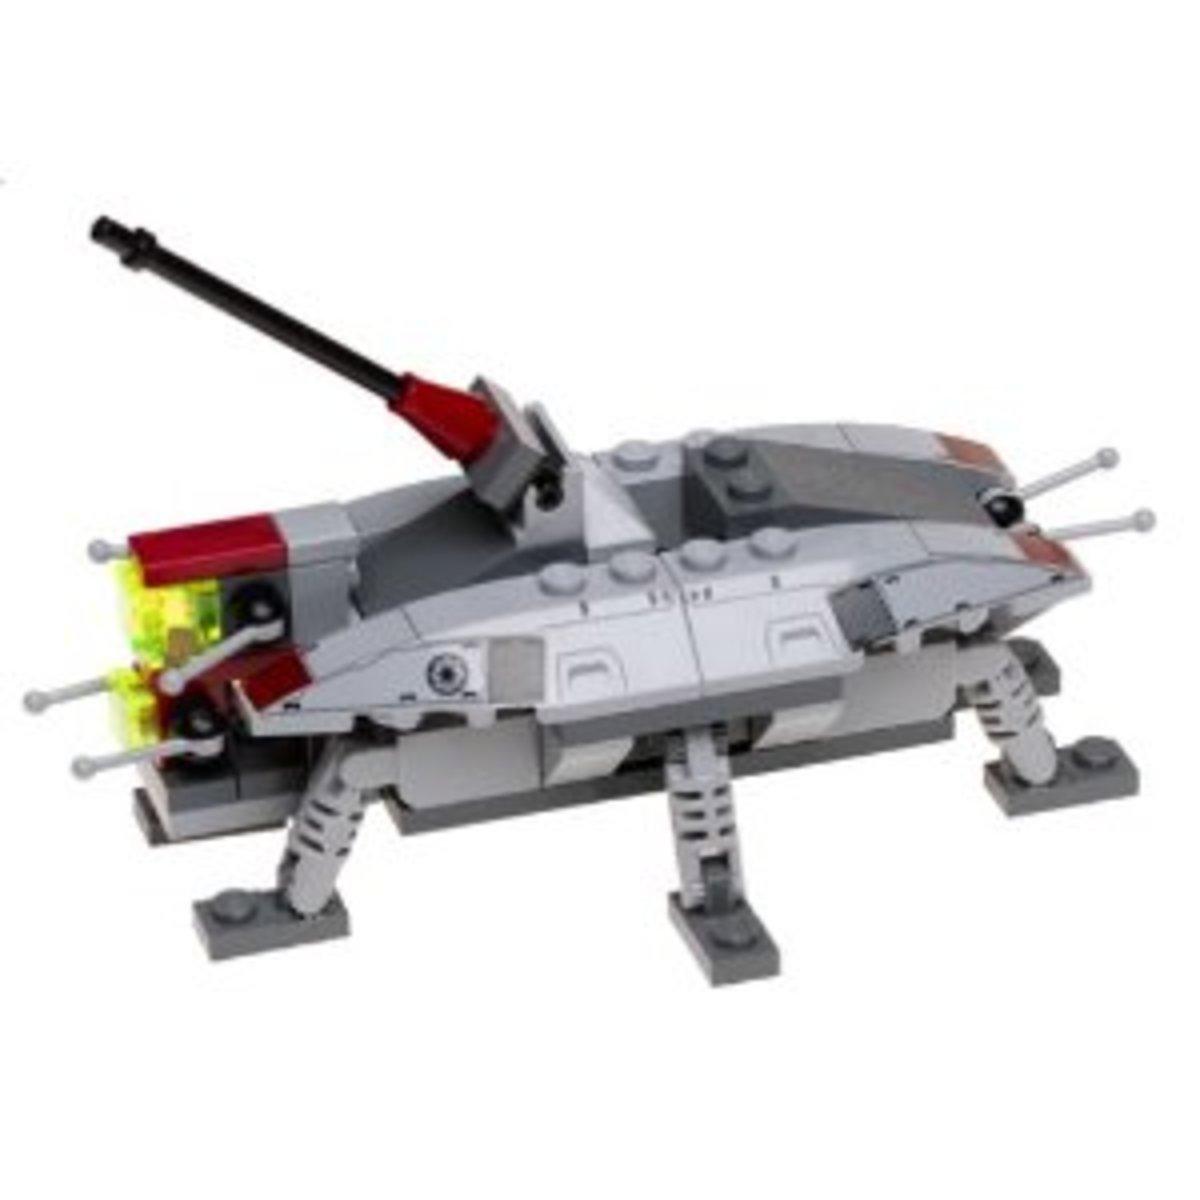 LEGO Star Wars AT-TE 4495 Assembled